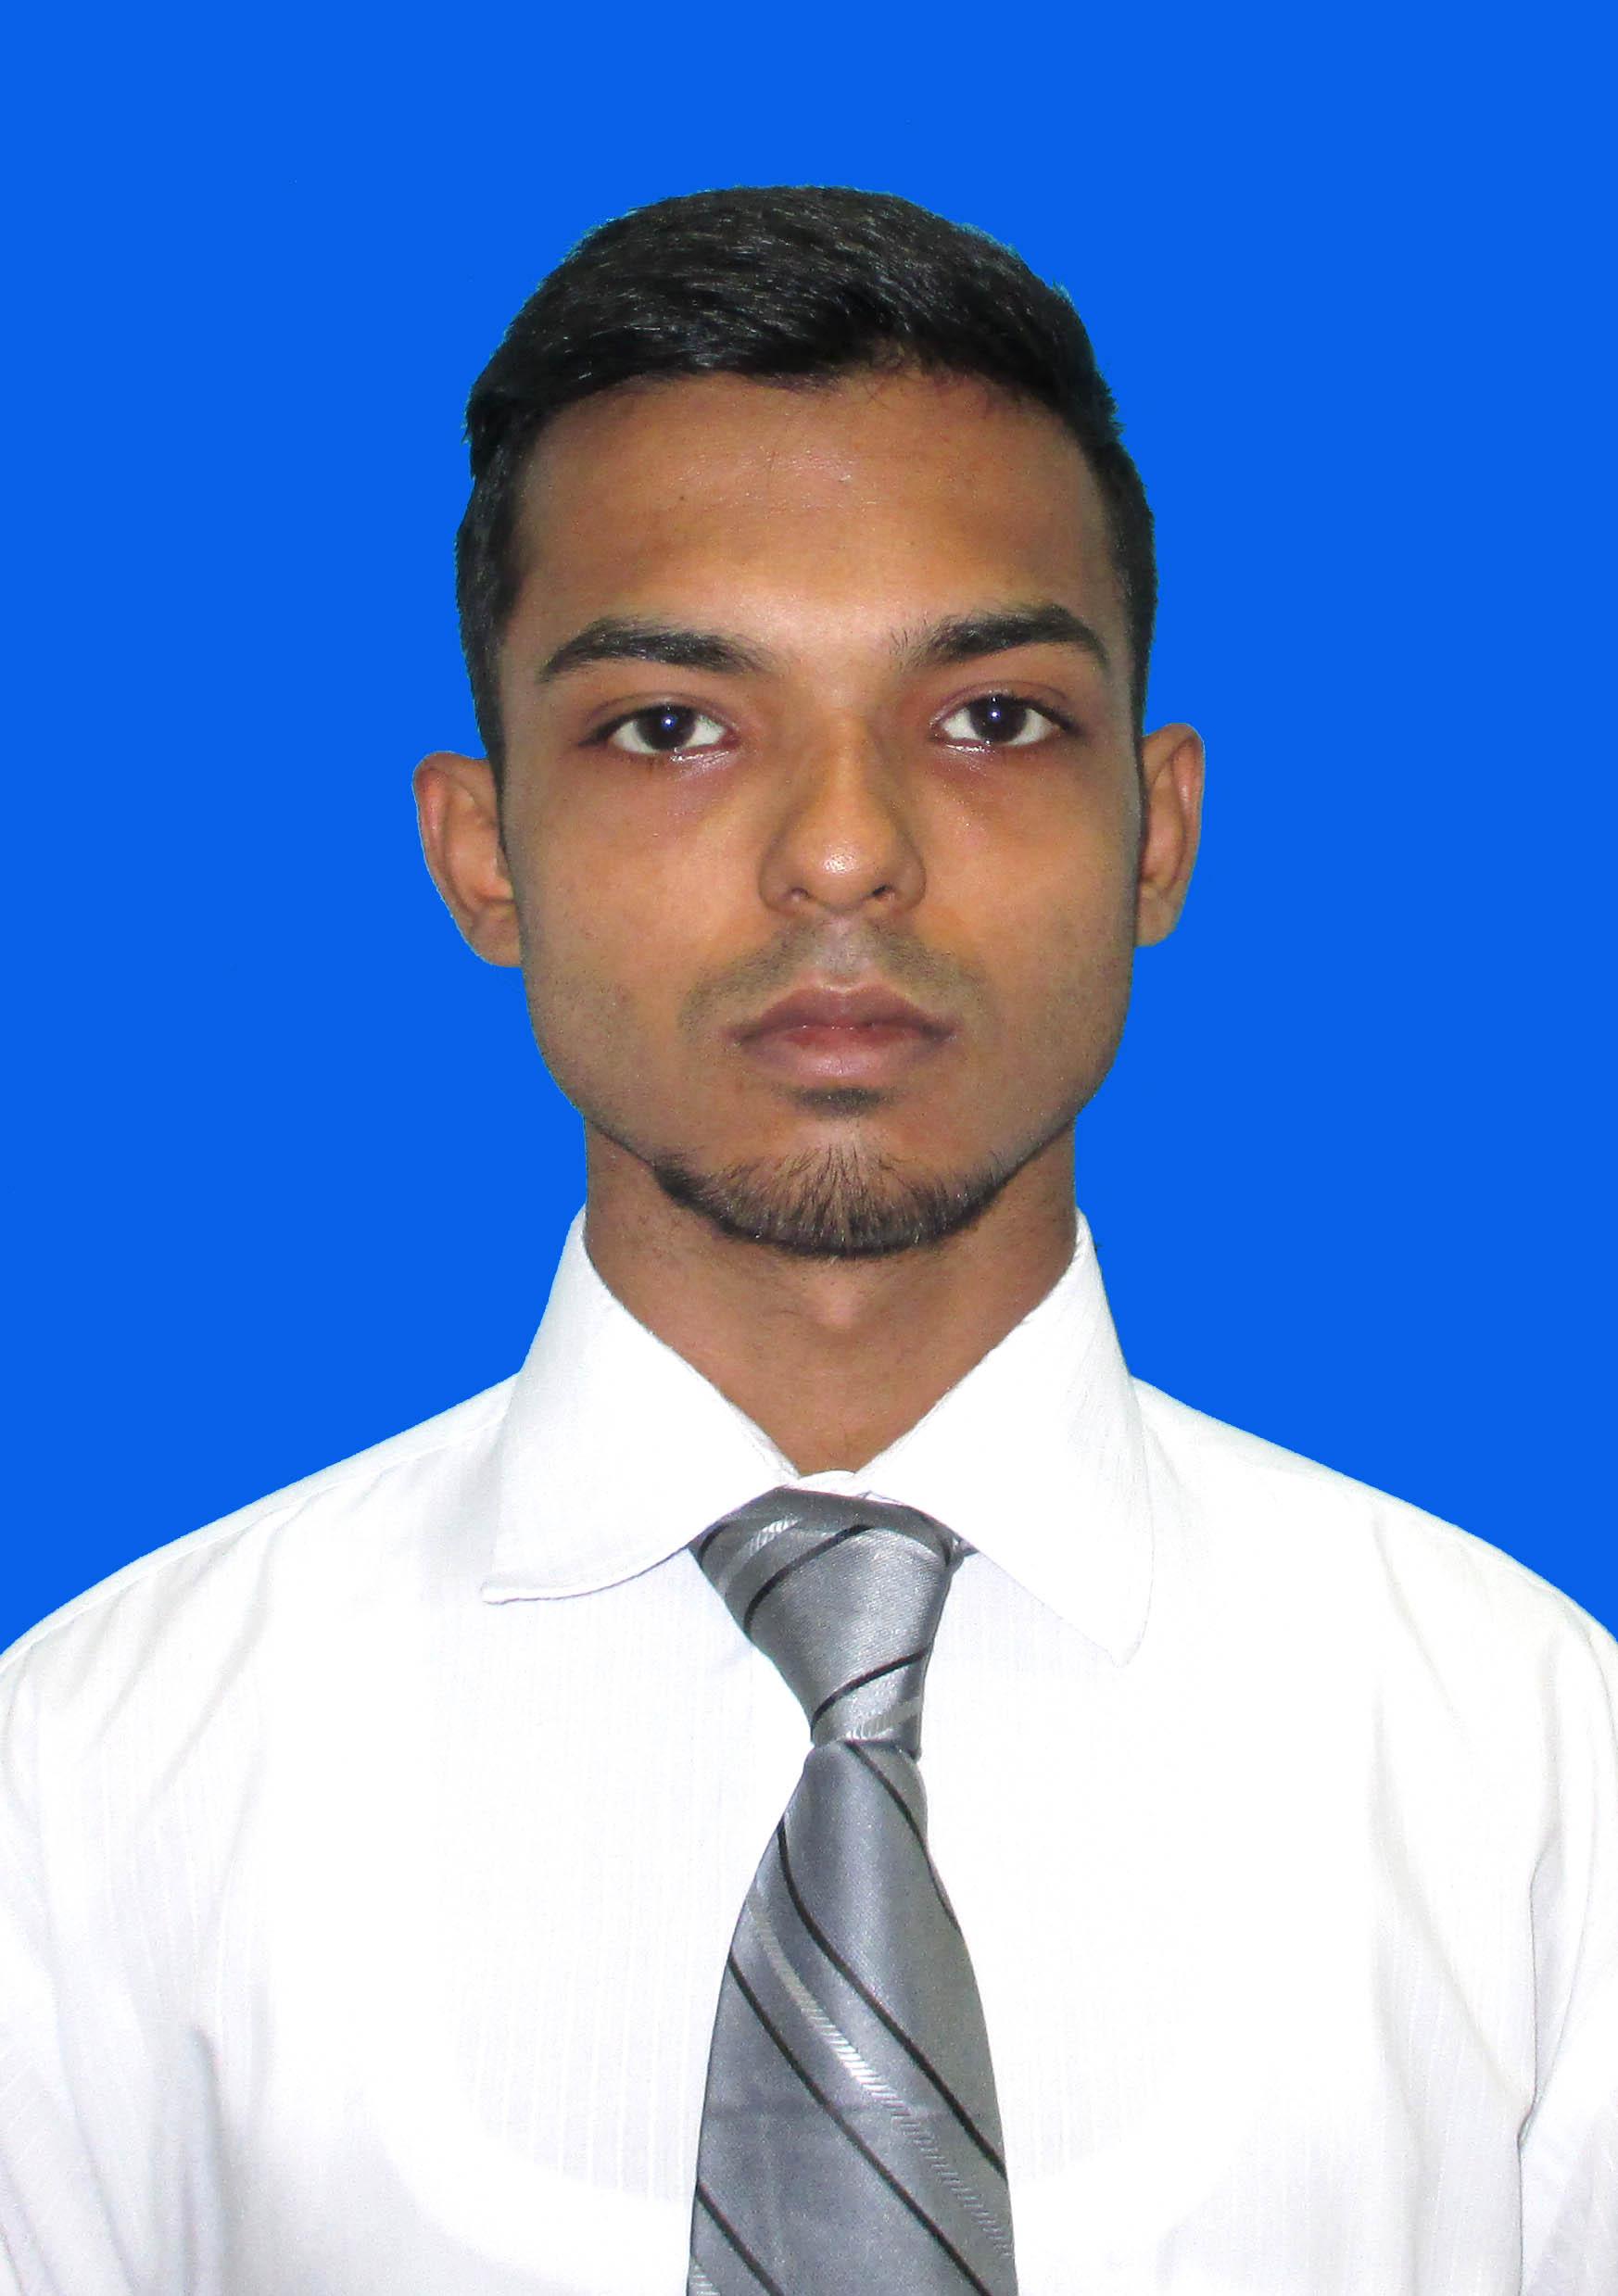 Muhammad Asad Hashmani Scientific Research, Engineering, Engineering Drawing, AutoCAD, Petroleum Engineering